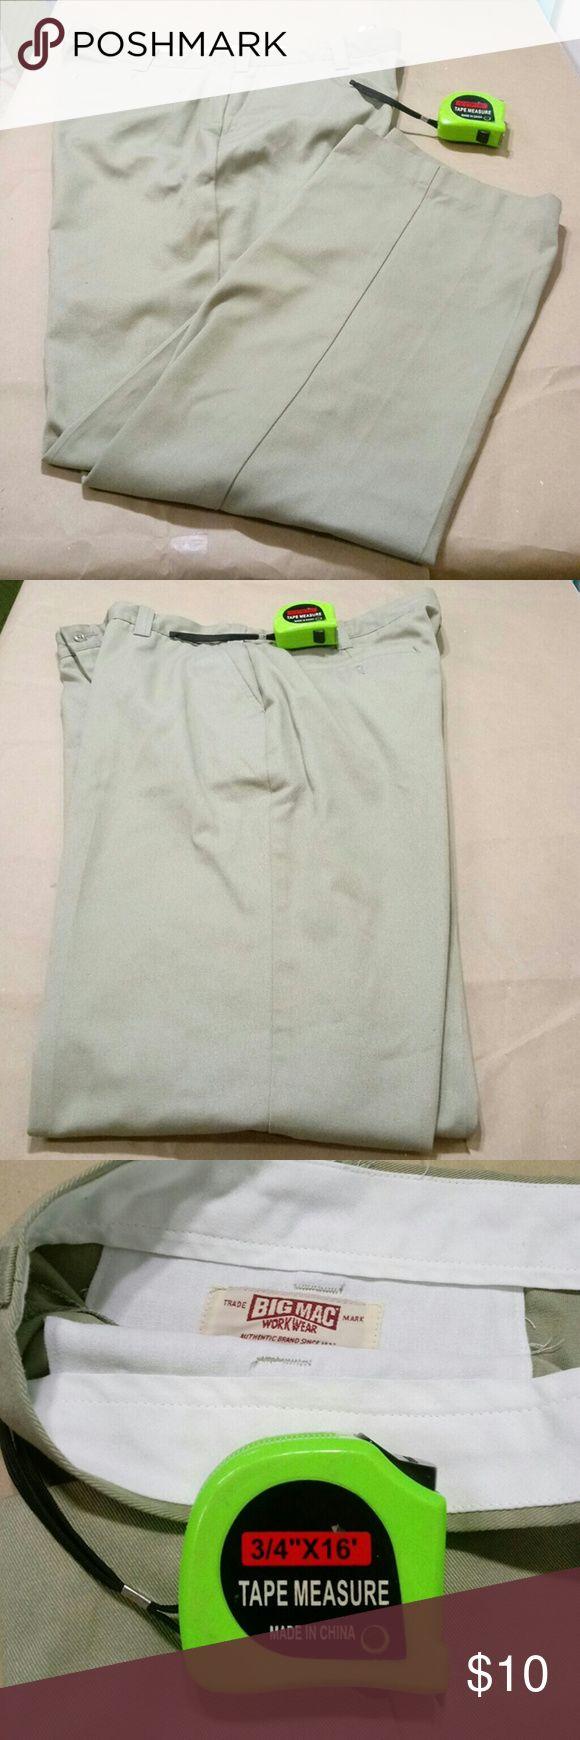 Mens Big Mac Work Wear Beige Pants 40x32 Mens Big Mac Work Wear Beige Pants 40x32 Authentic Brand-Durable-Pleat Front-Casual 40Wx32L -Excellent Condition-Cotton&Polyester Blend Big Mac Pants Chinos & Khakis